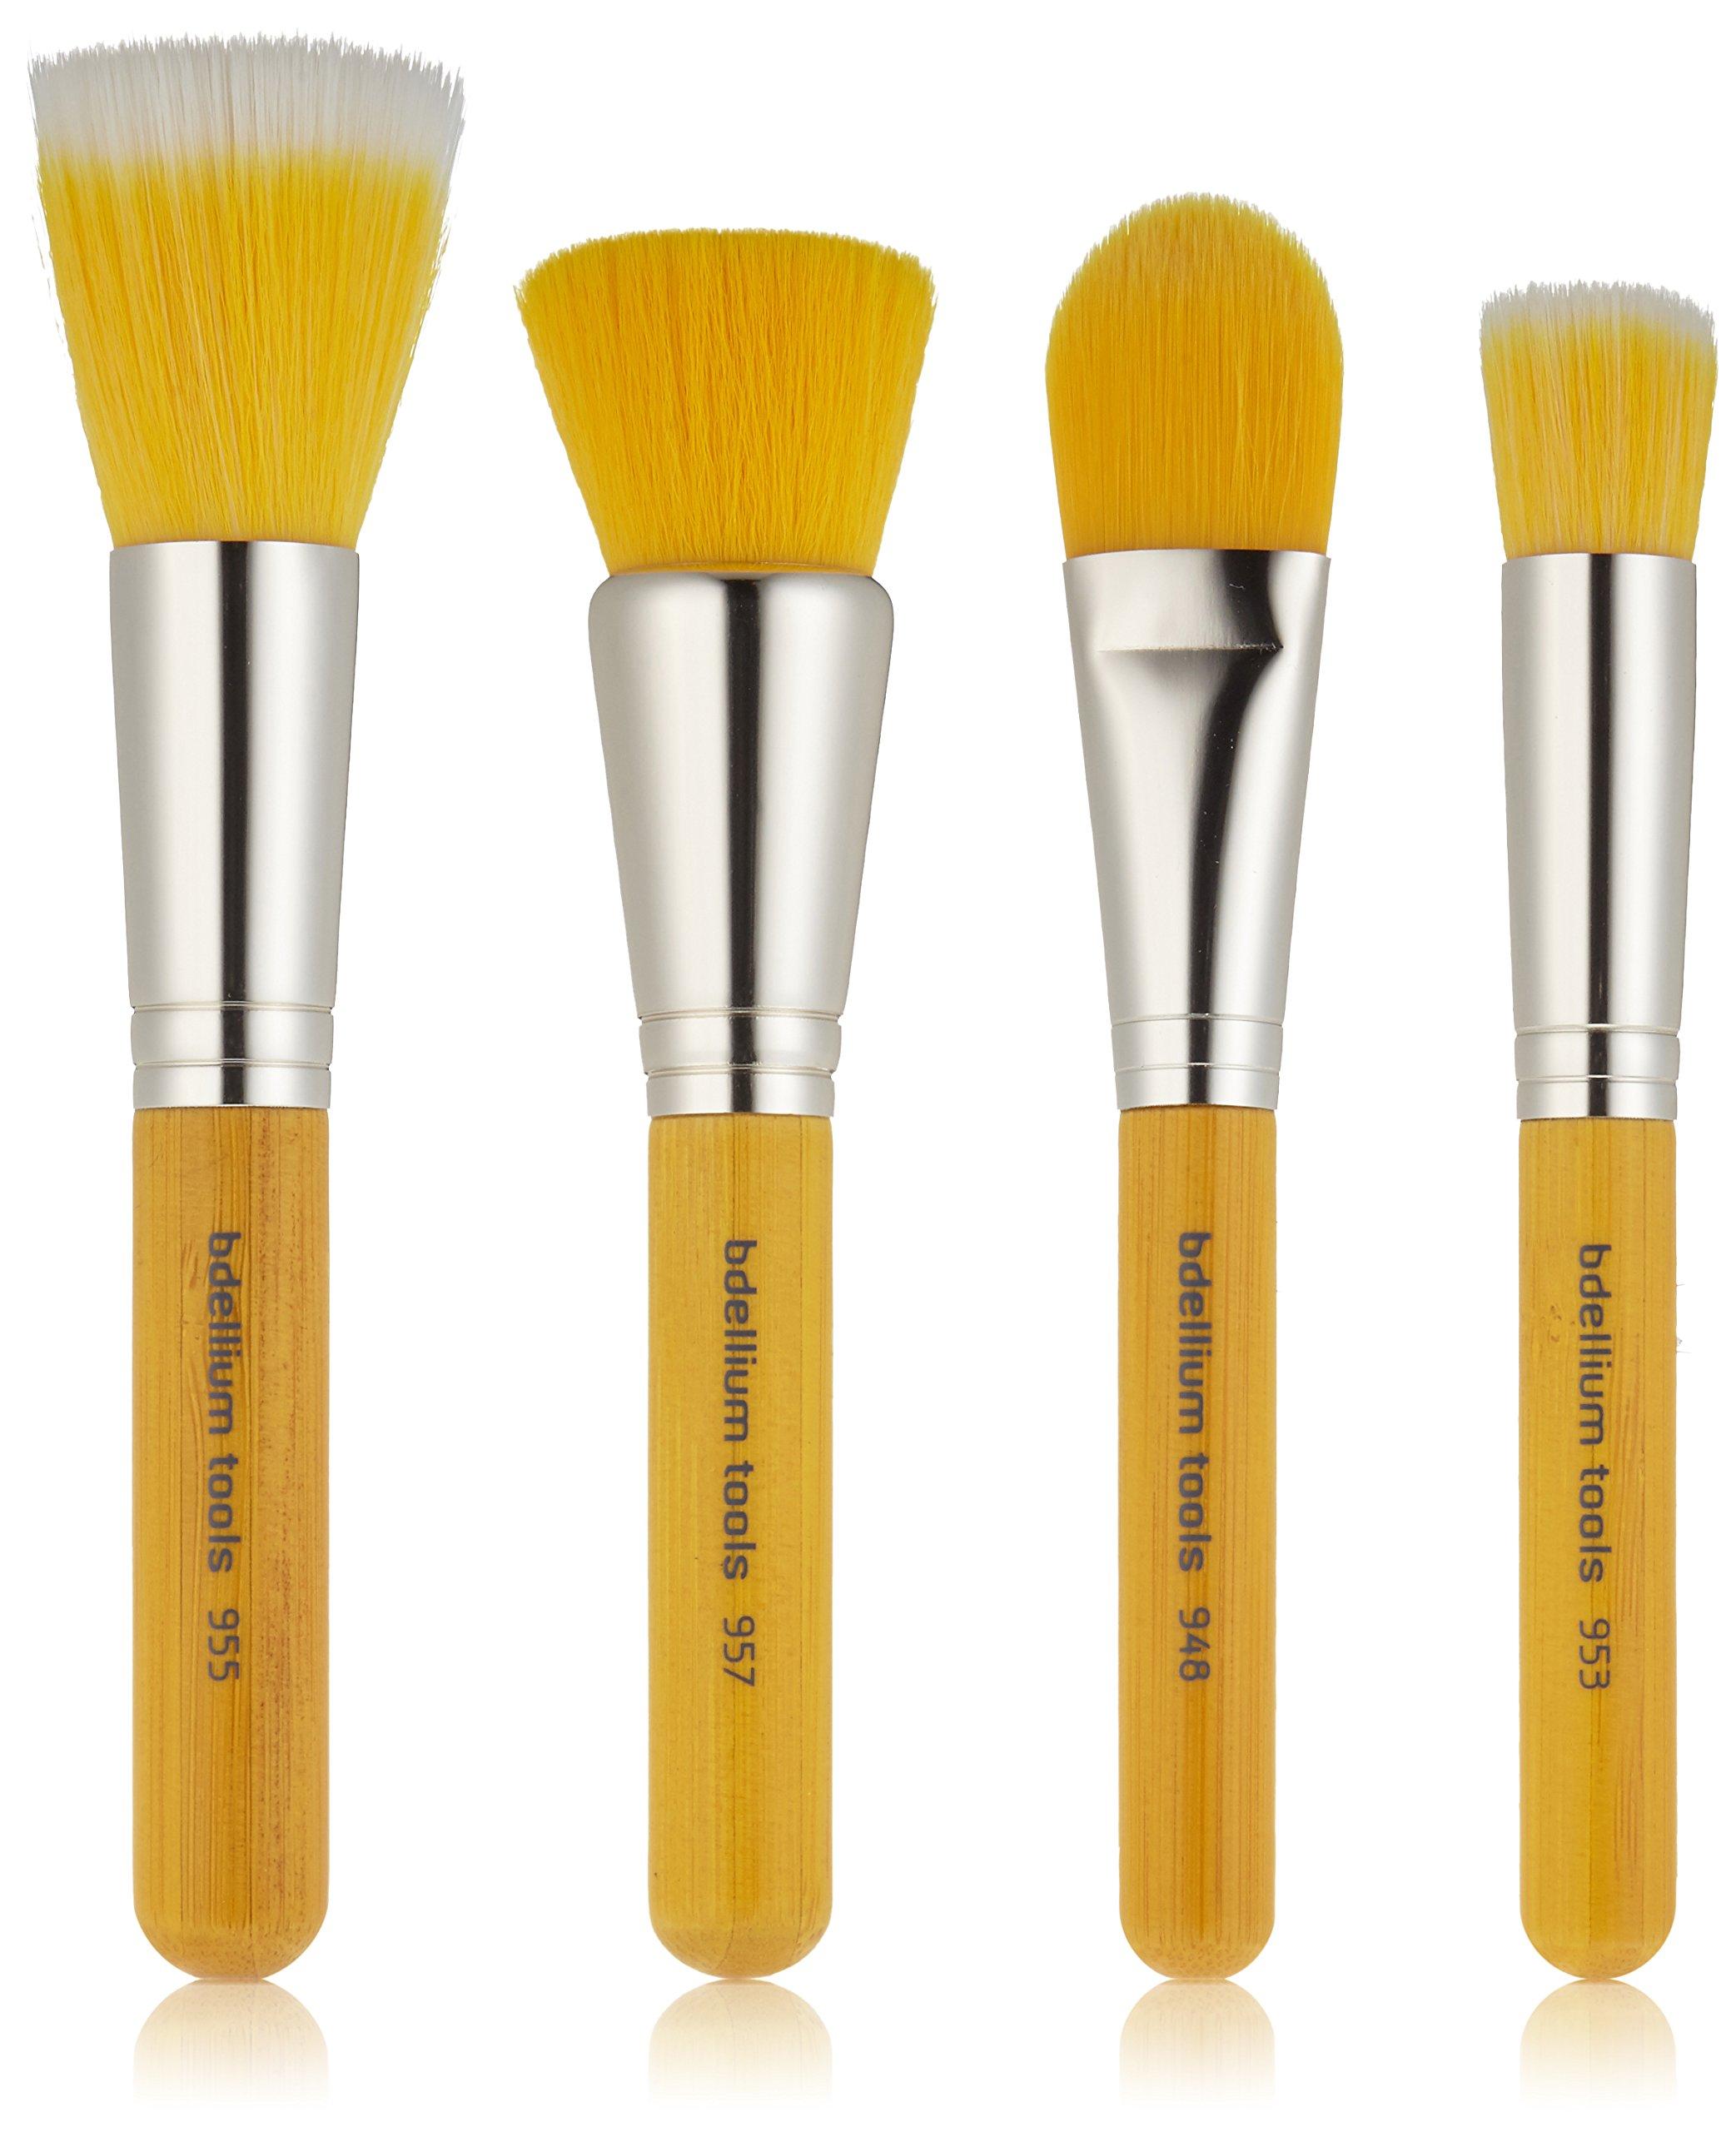 Bdellium Tools Special Edition Bambu Foundation Set, Yellow by Bdellium Tools